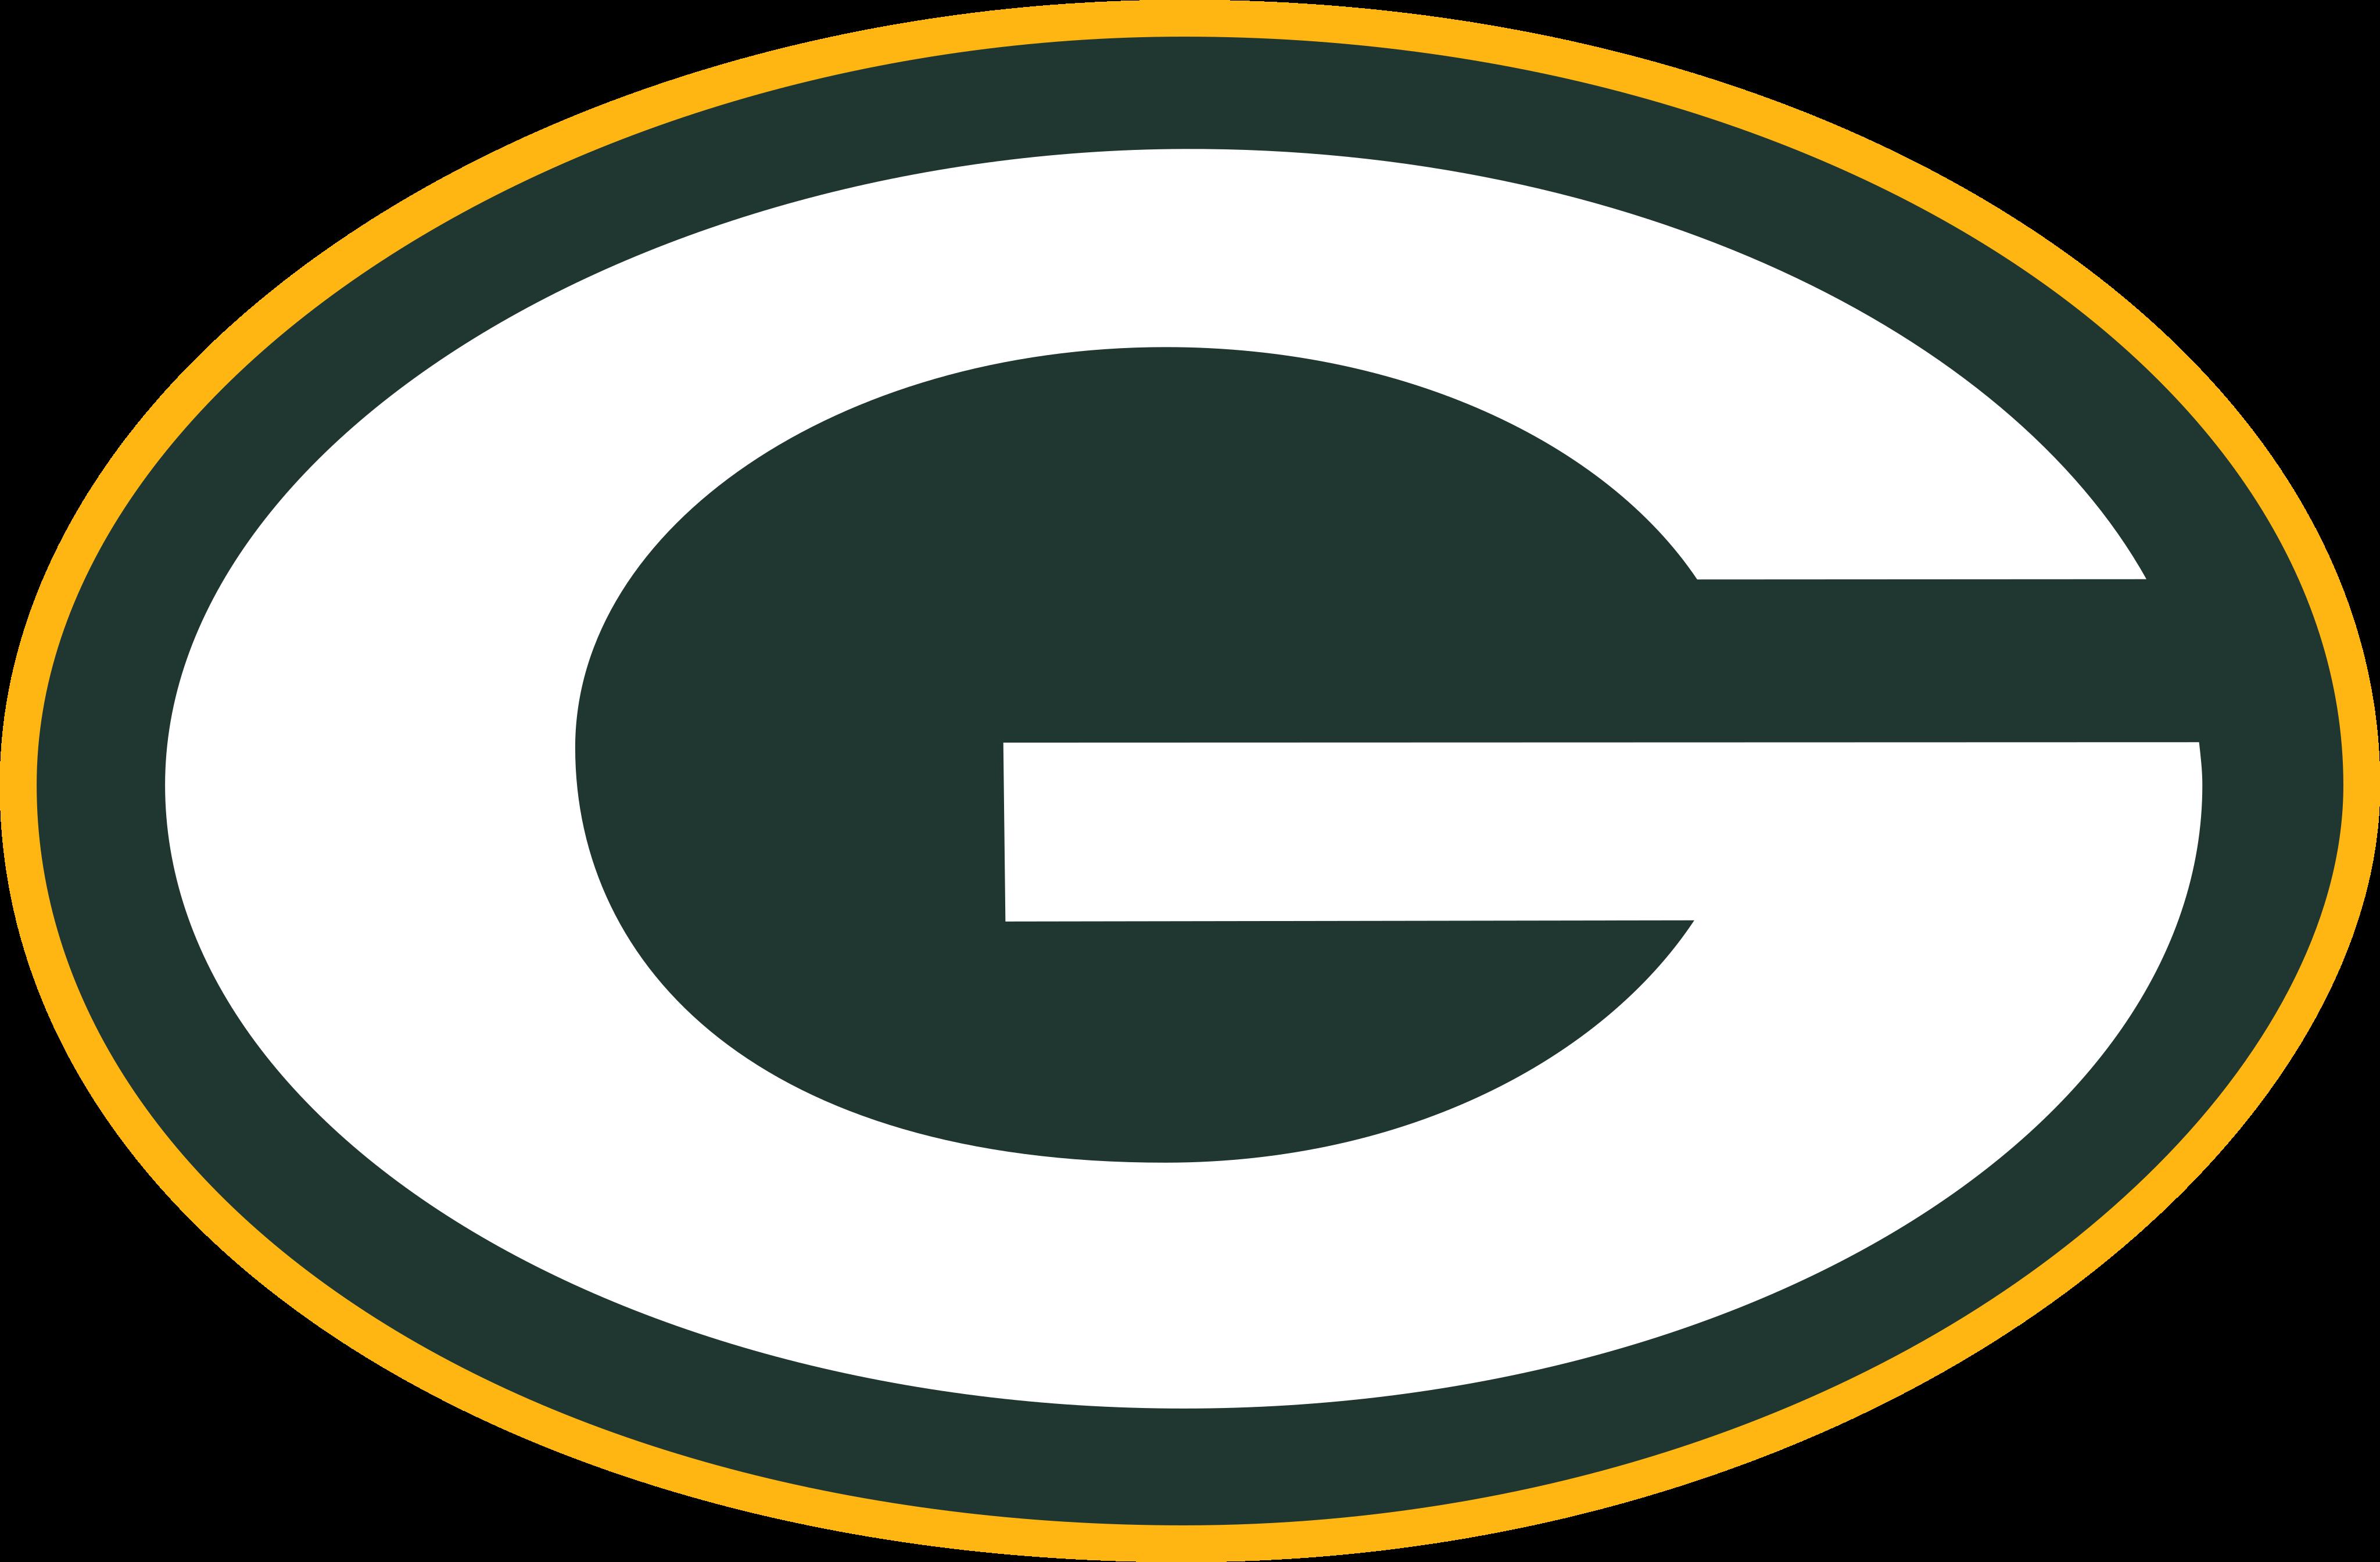 green bay packers logo 1 - Green Bay Packers Logo